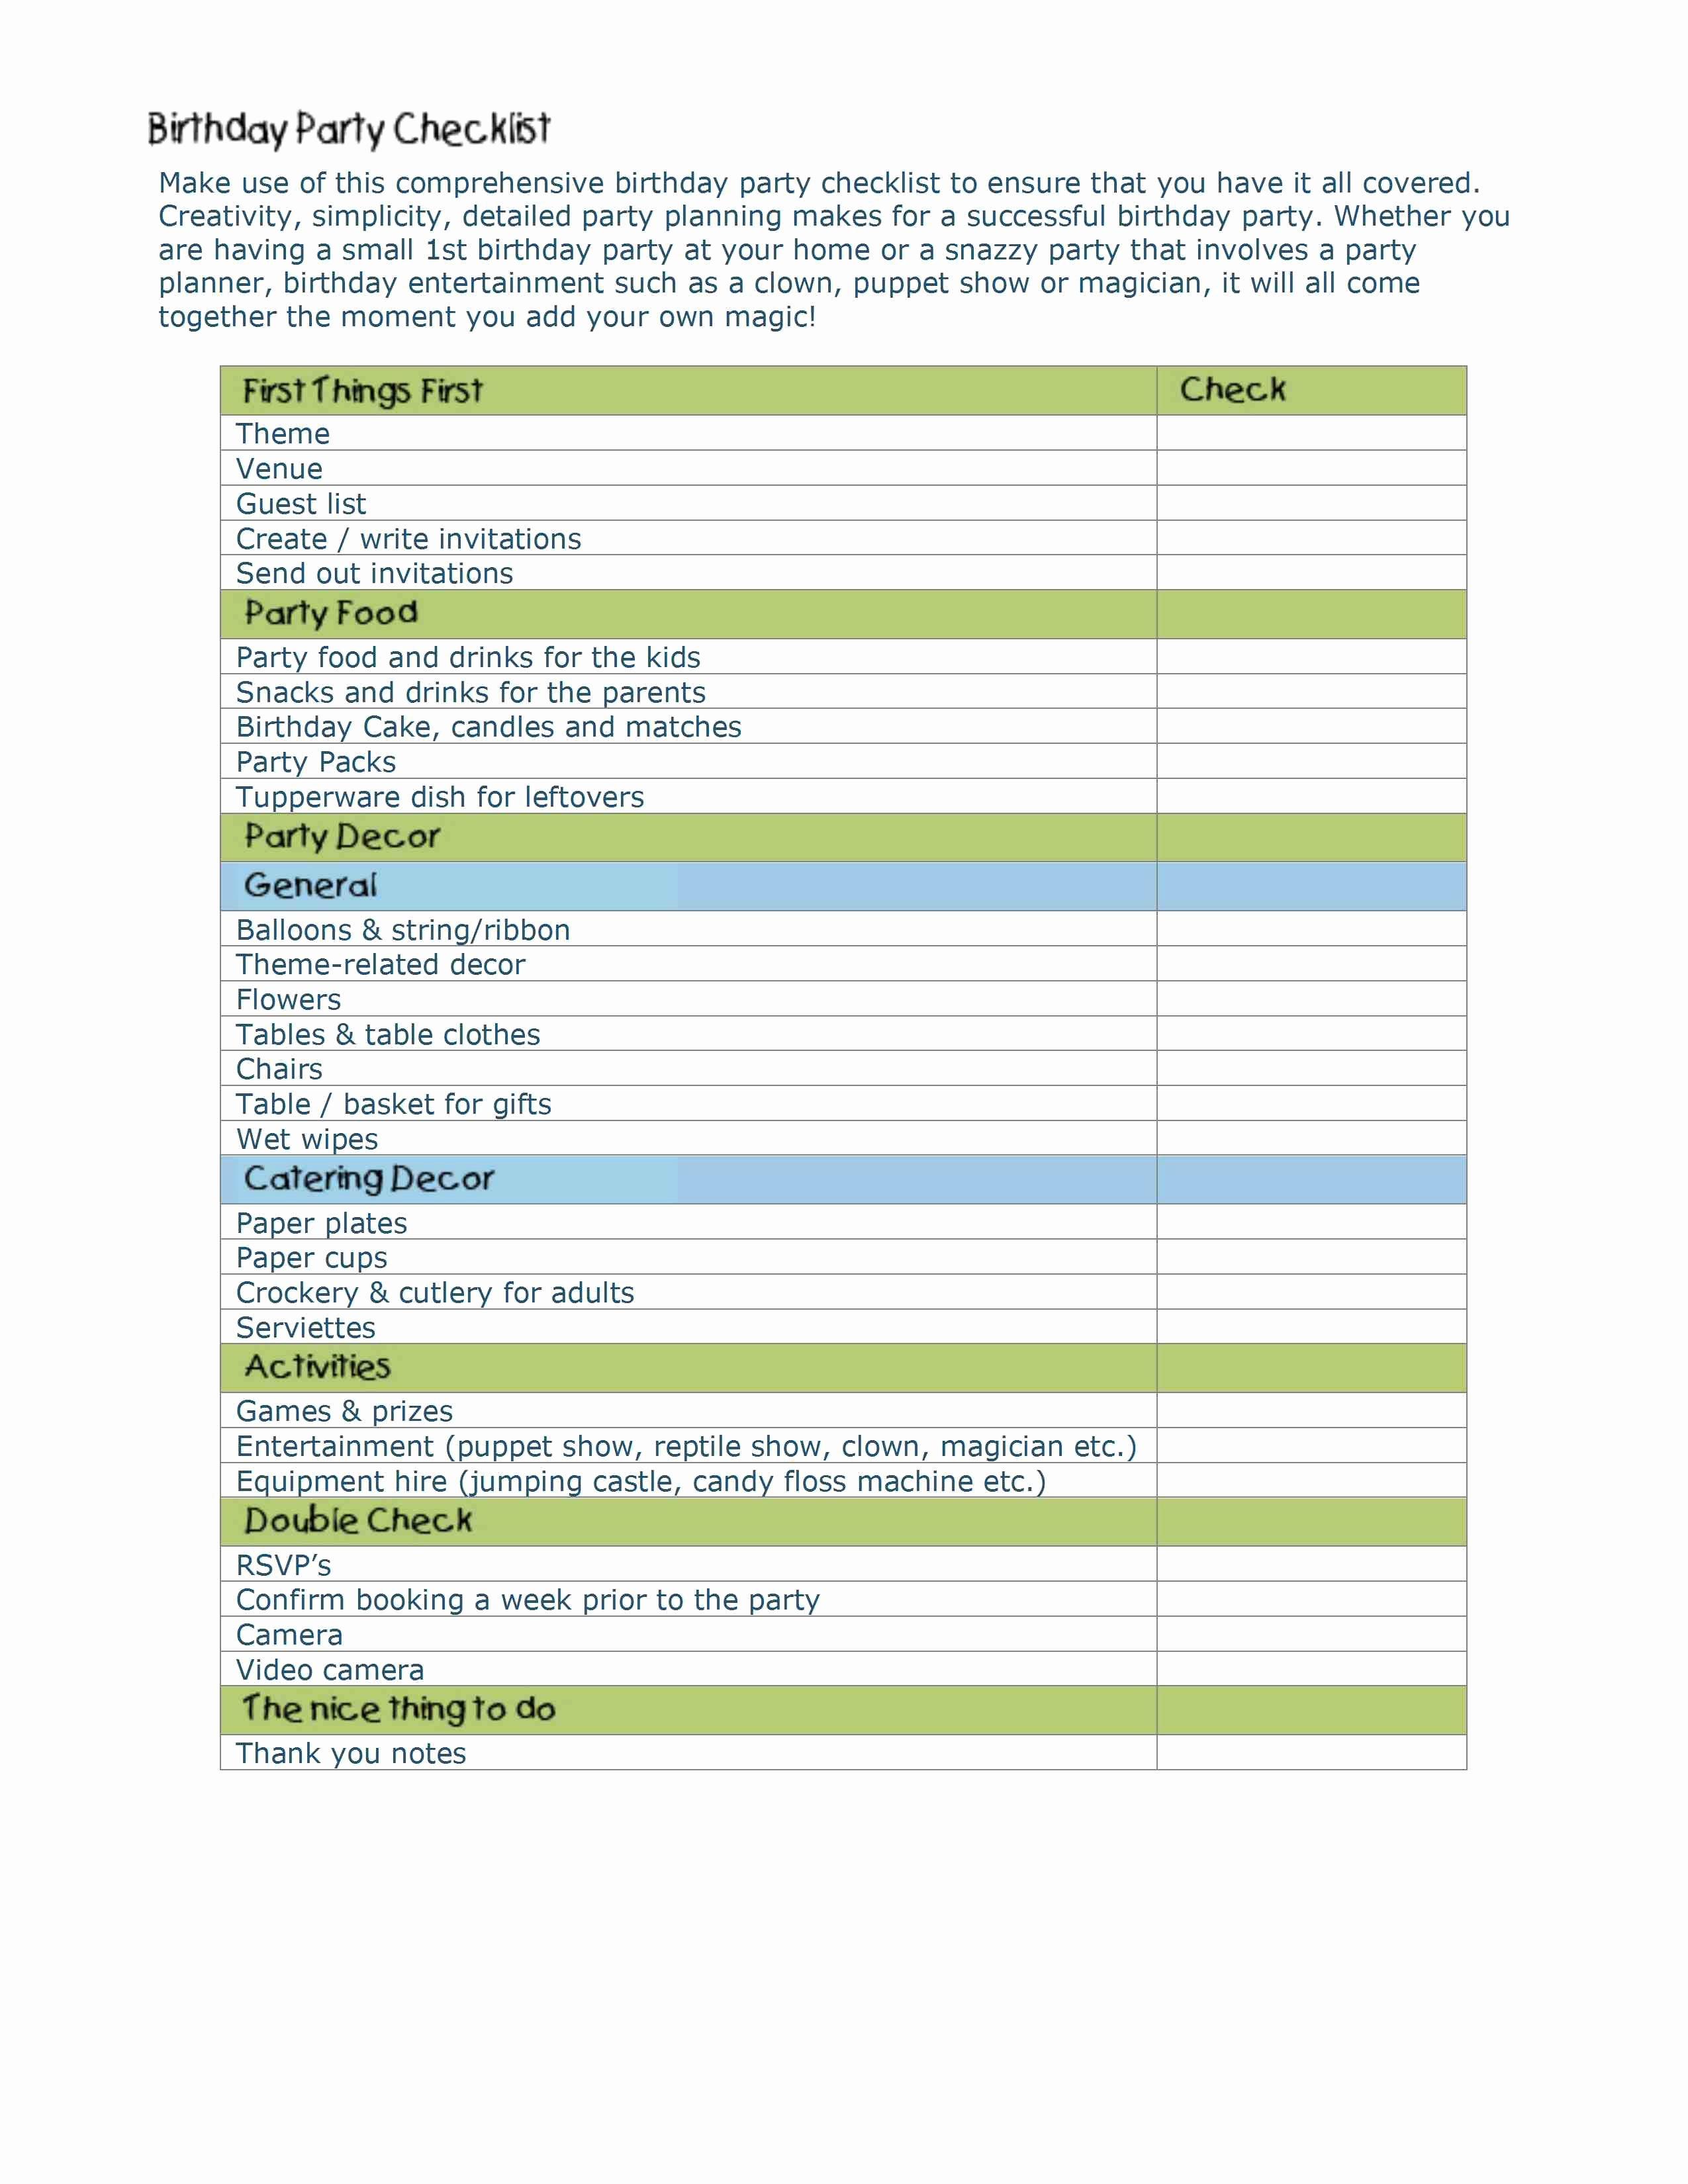 Party Plan Checklist Template Elegant event Planning Checklist Template